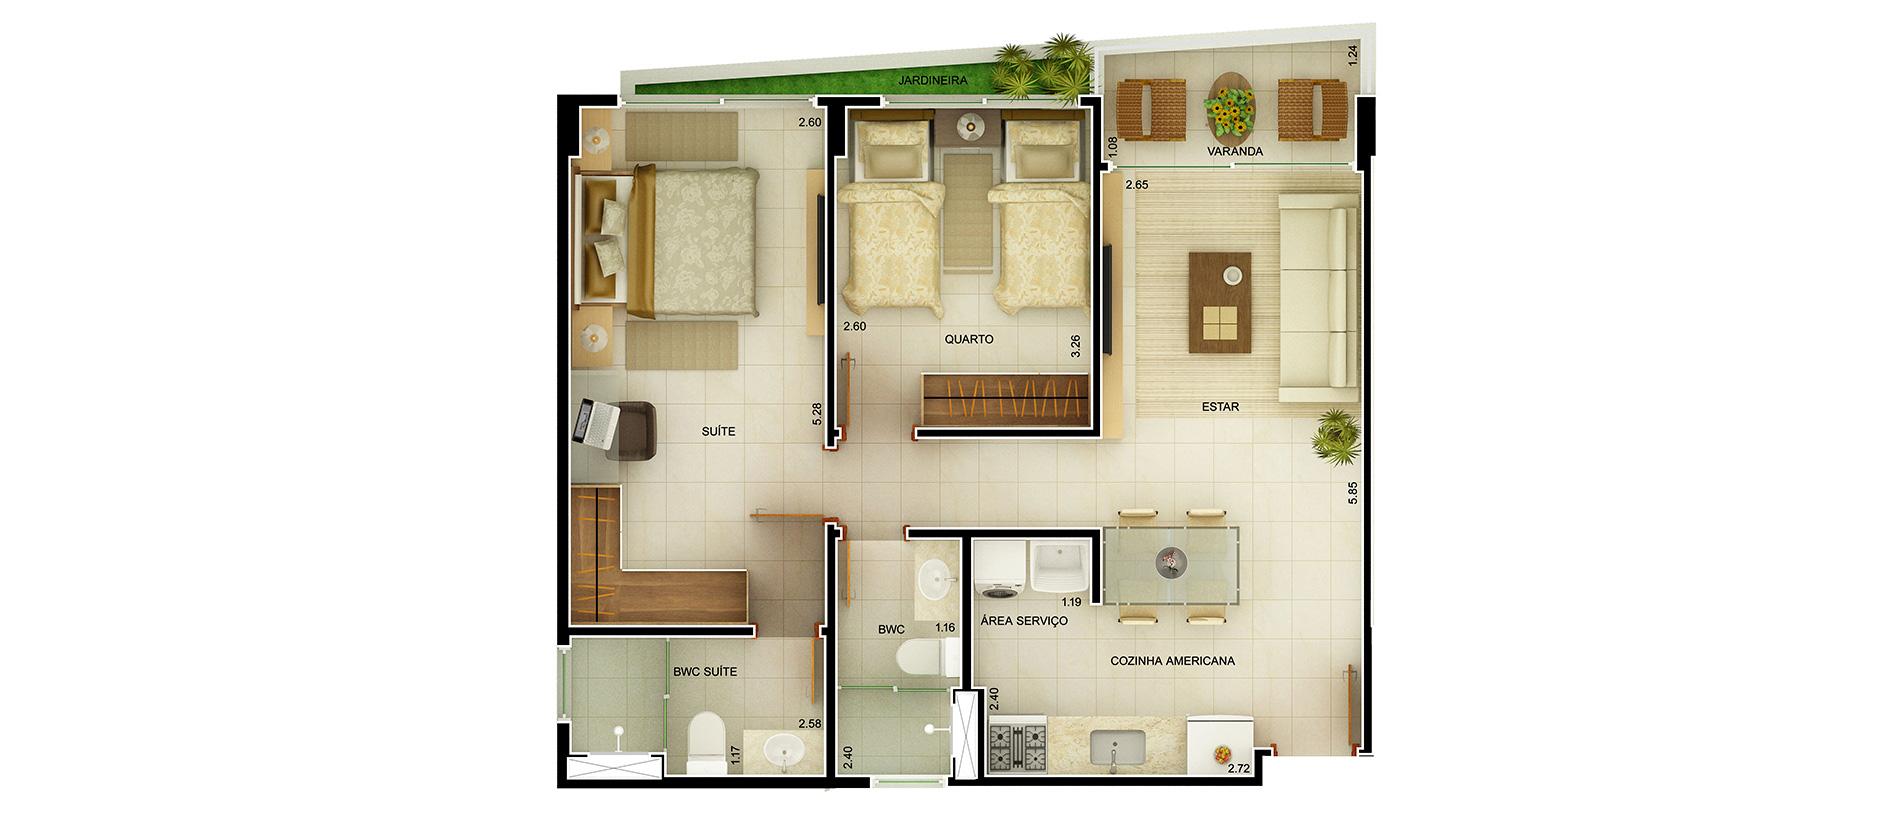 6- Planta Baixa Apartamento Tipo